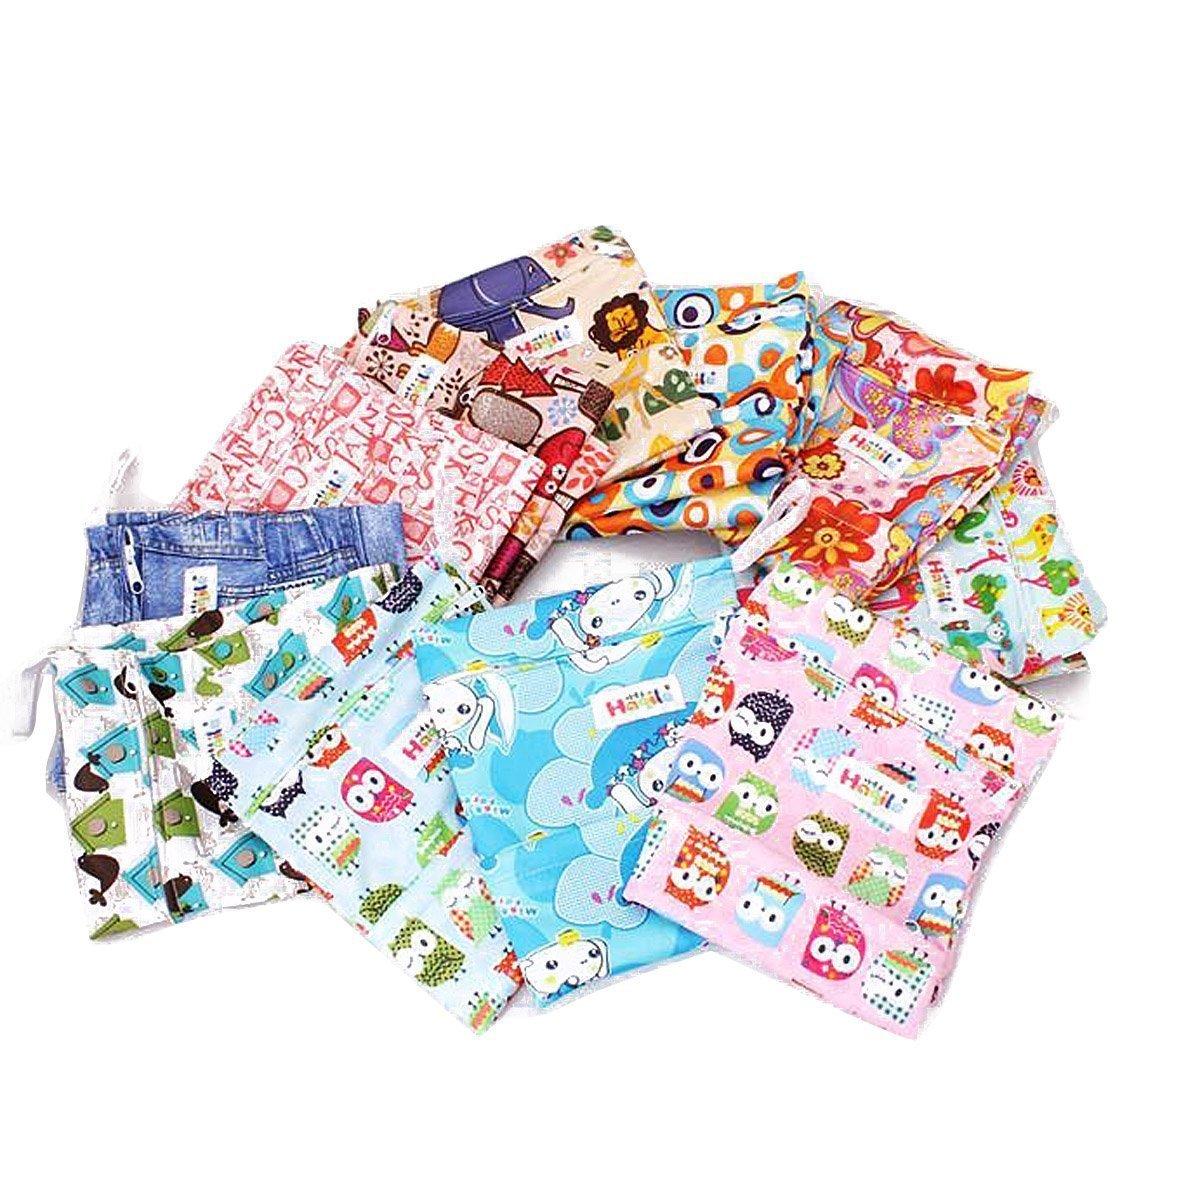 Wet bag washable reusable cloth diaper nappies bags waterproof  Hf